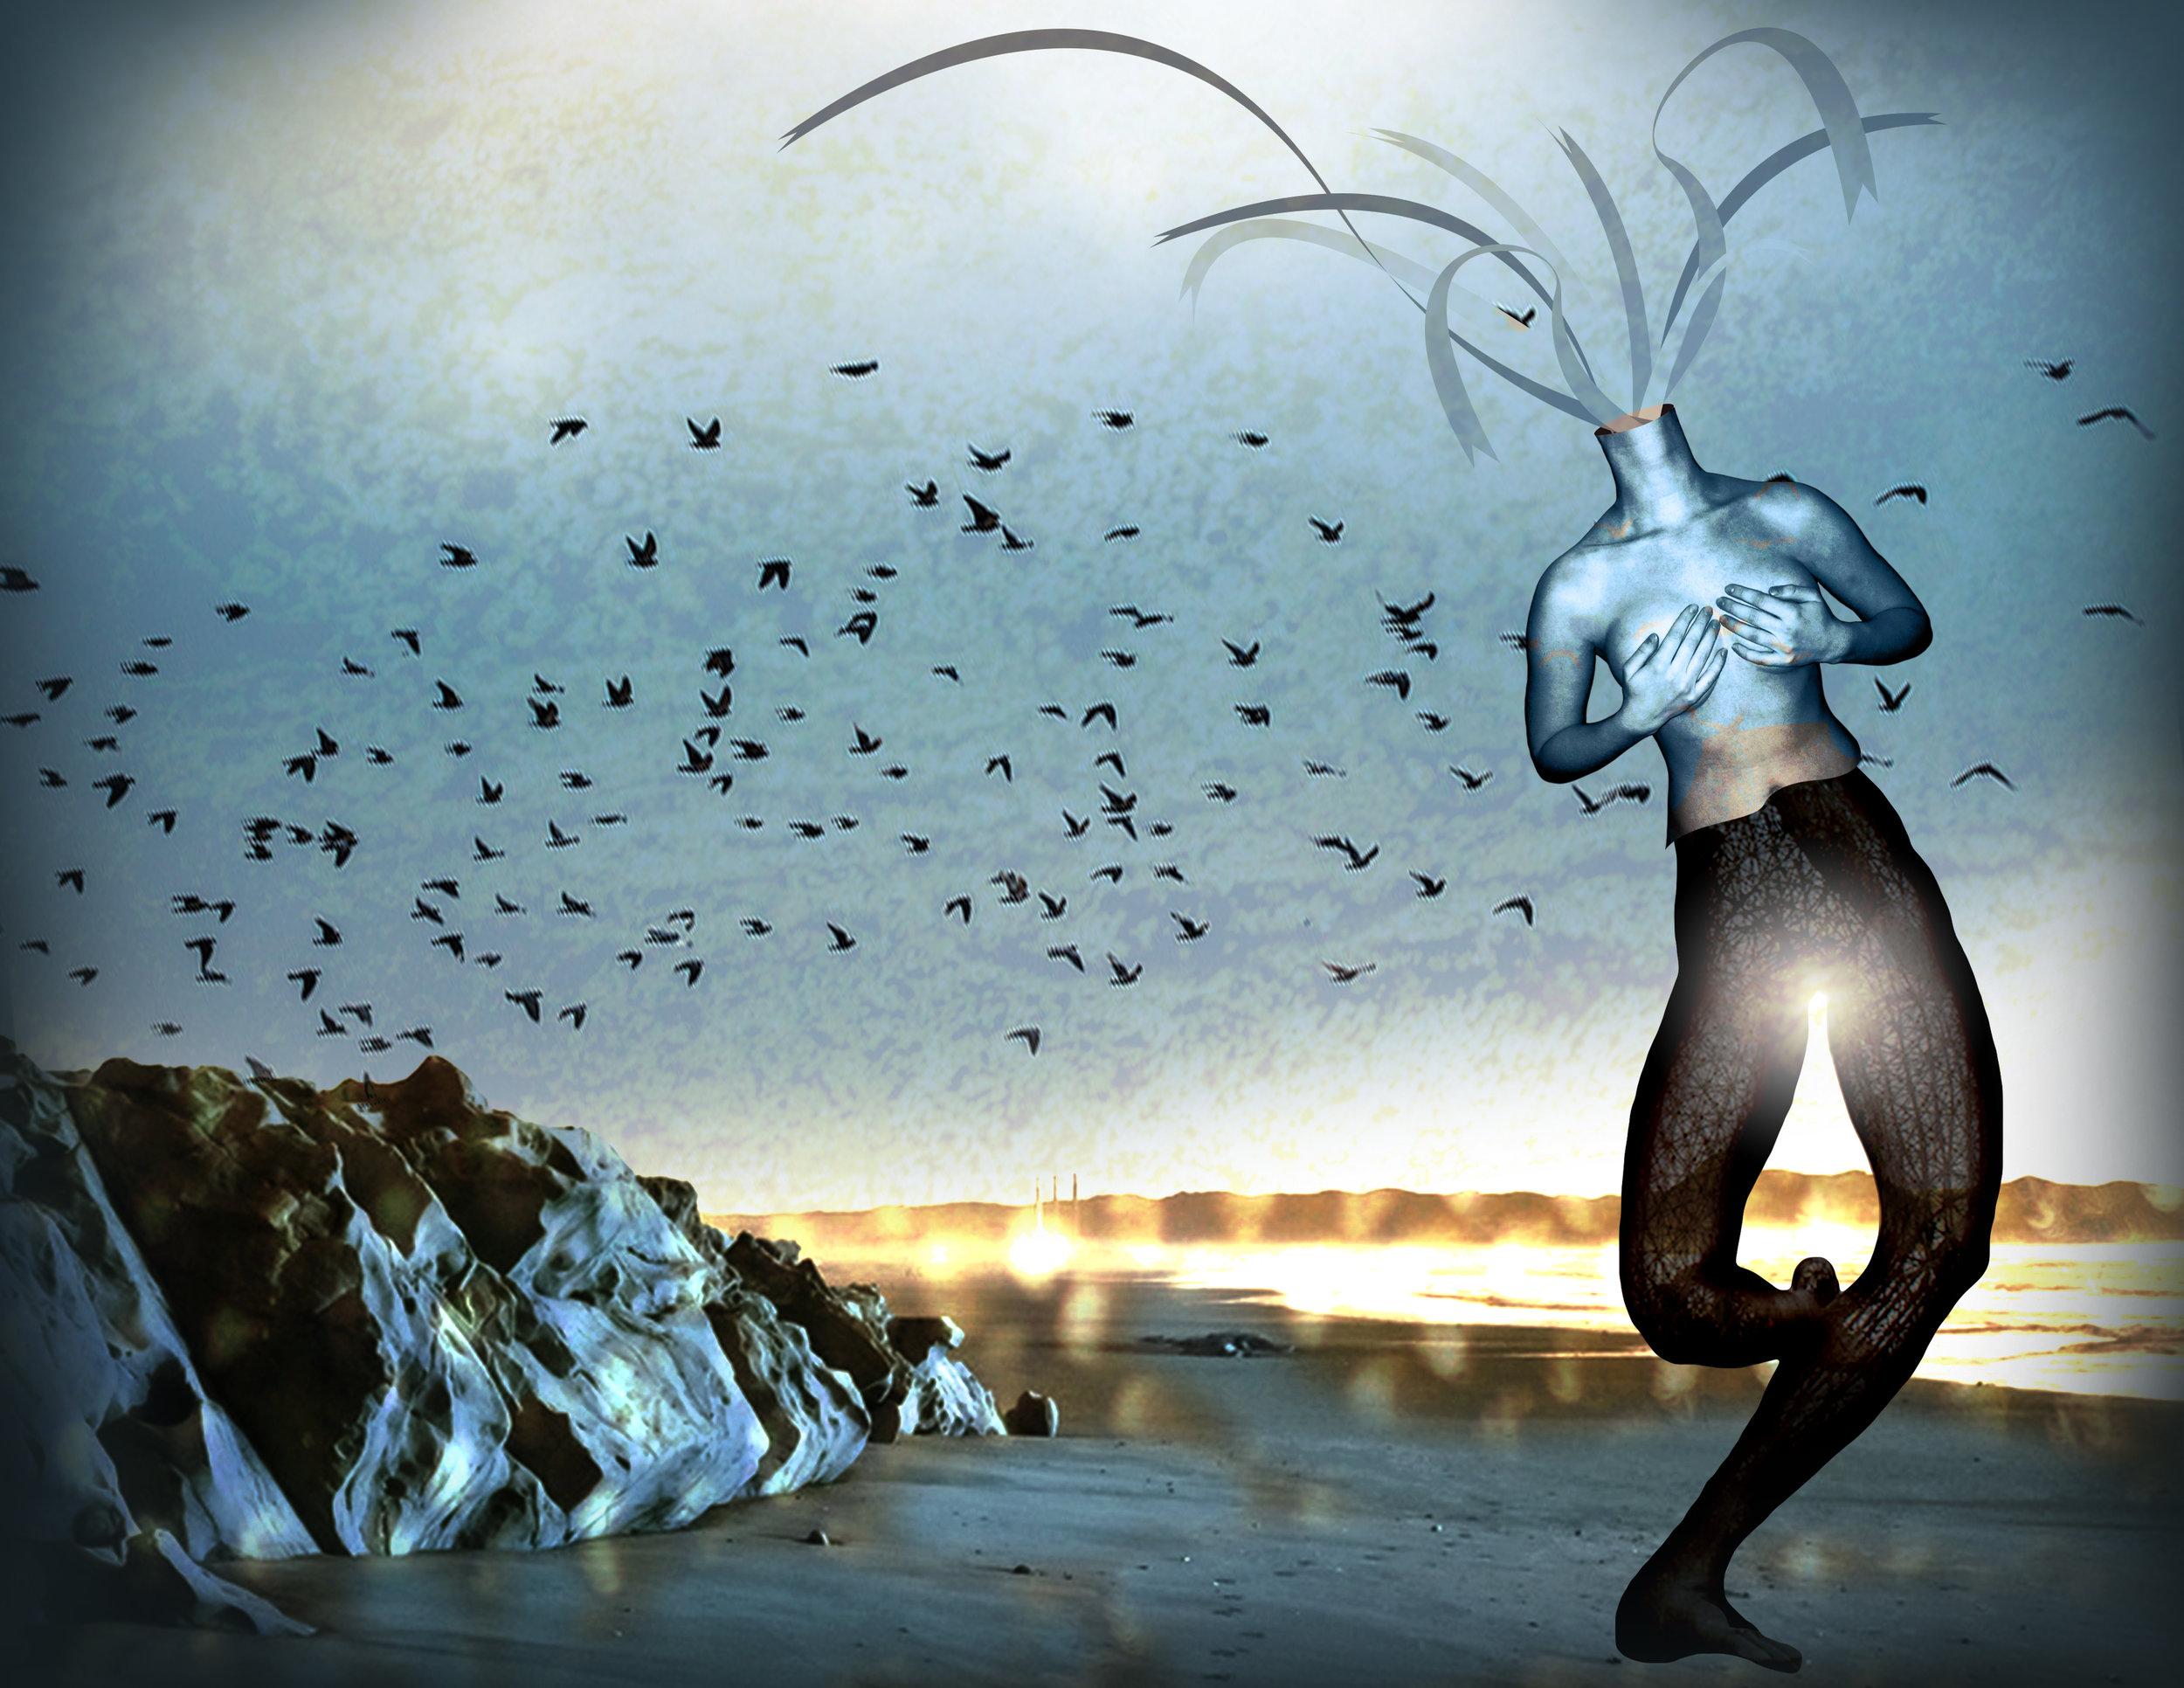 dd25_KaylaCherkas_Surrealism.jpg